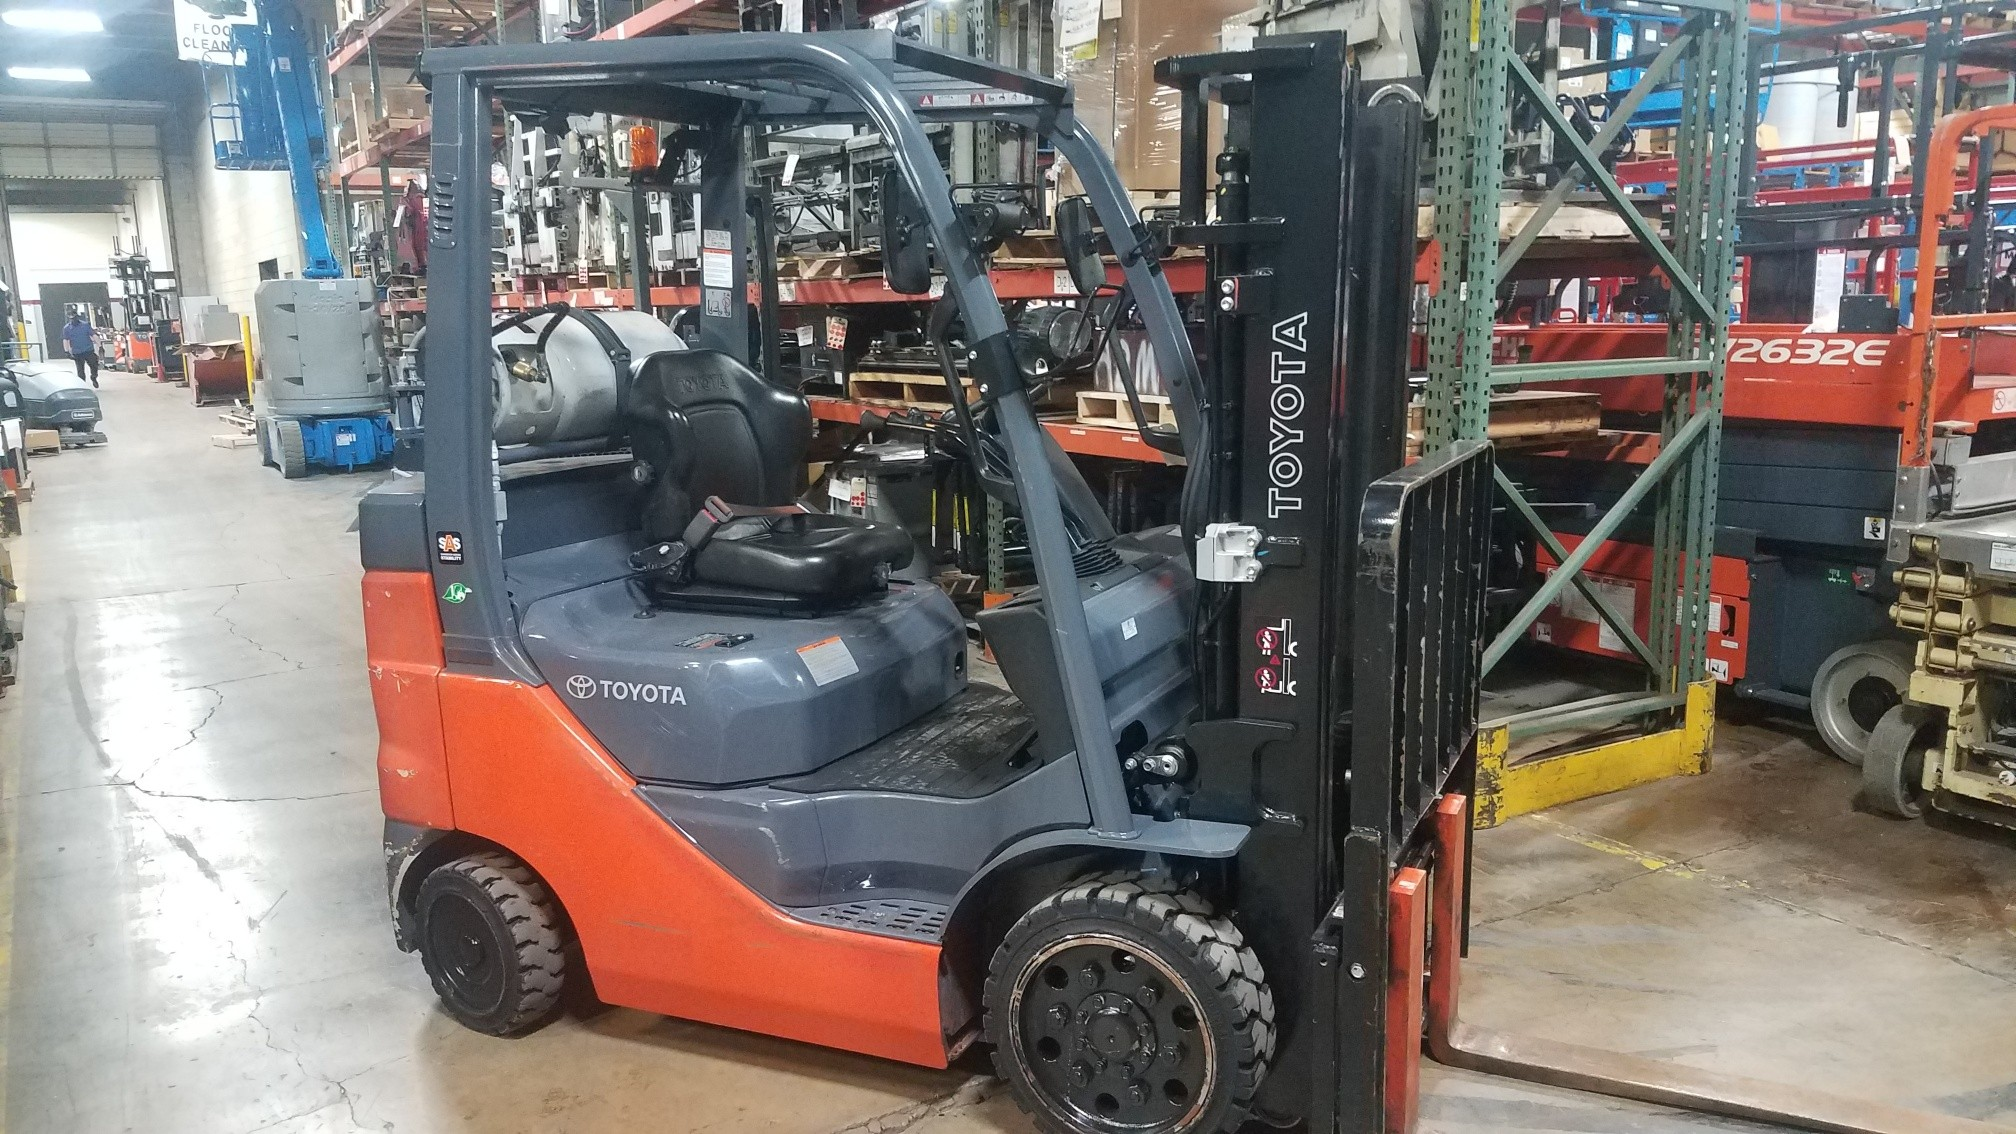 Used, 2020, Toyota Industrial Equipment, 8FGCU25, Forklifts / Lift Trucks